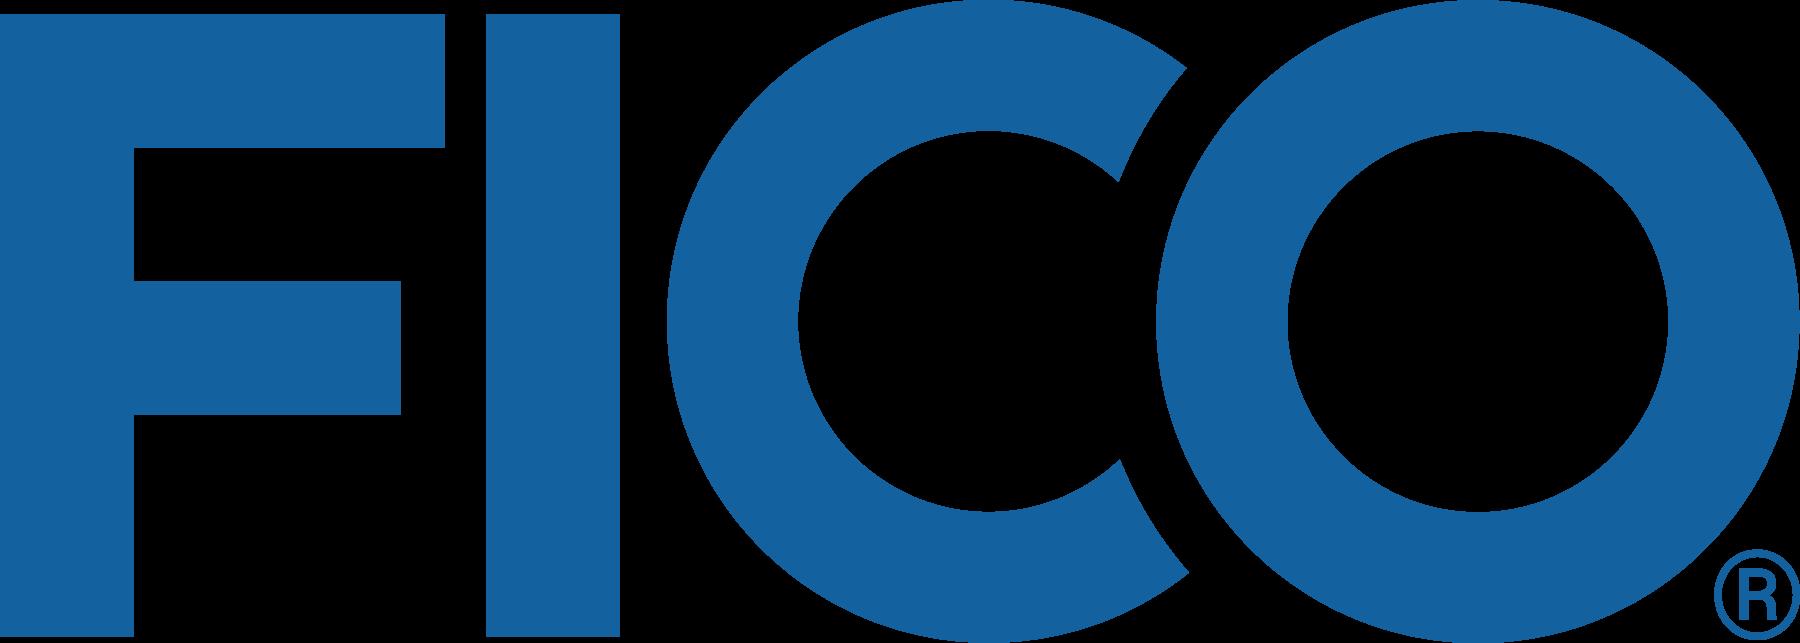 "FICO's Newest Project: The ""Enterprise Security Score"""